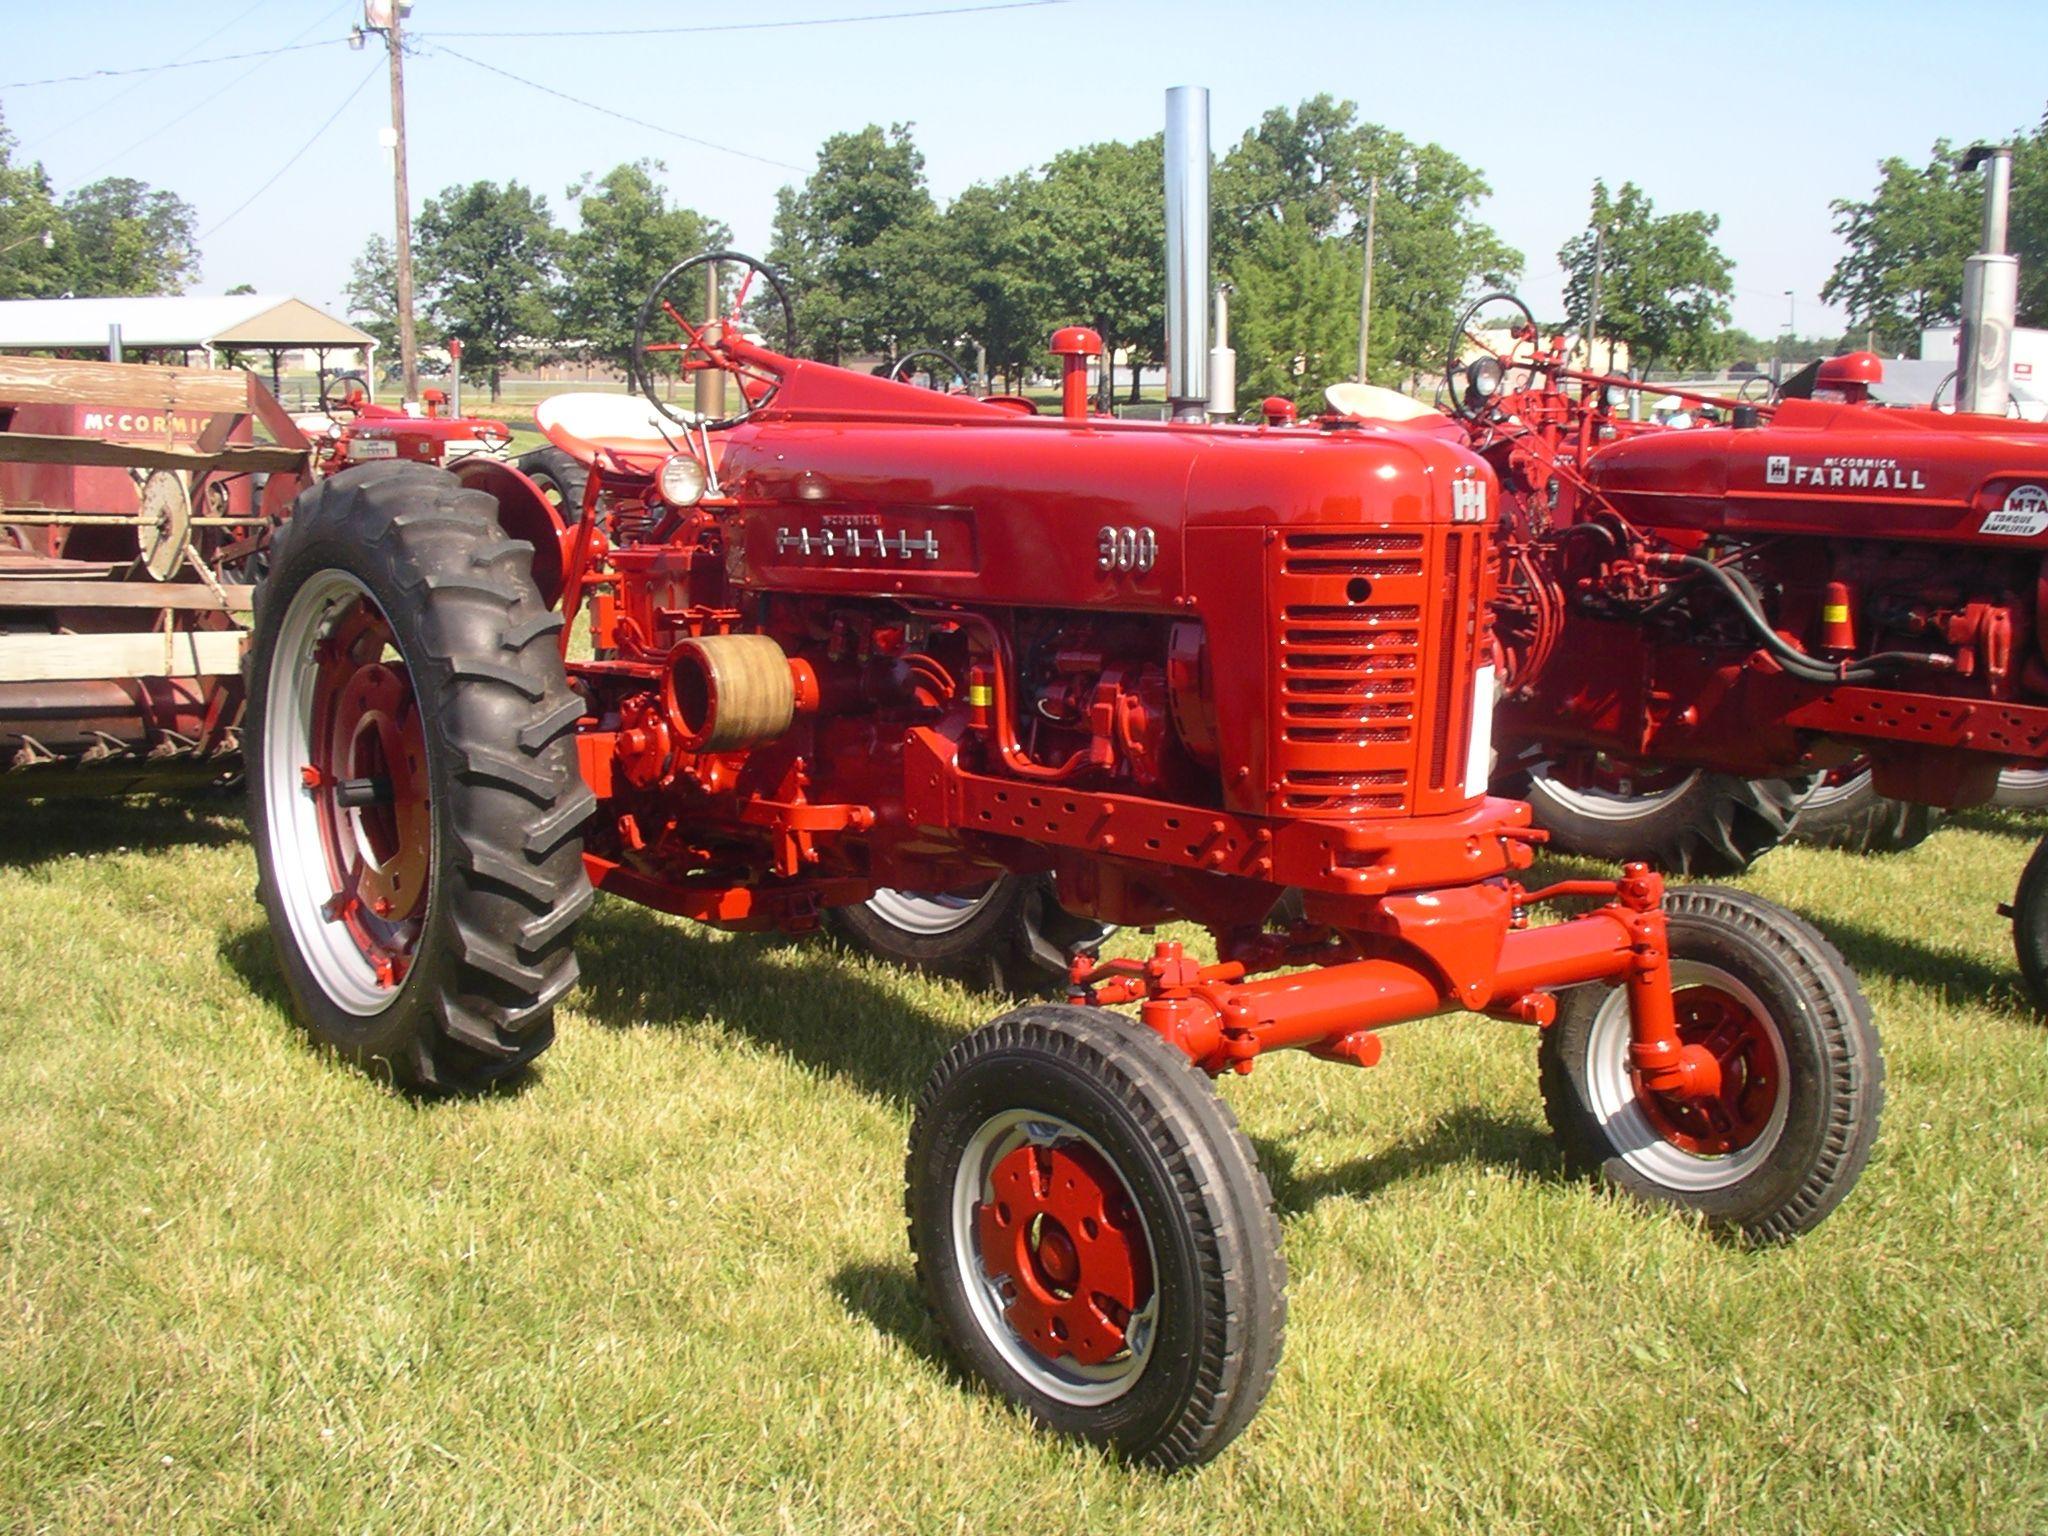 1955 Farmall 300 Farmall Tractors Farmall Tractors